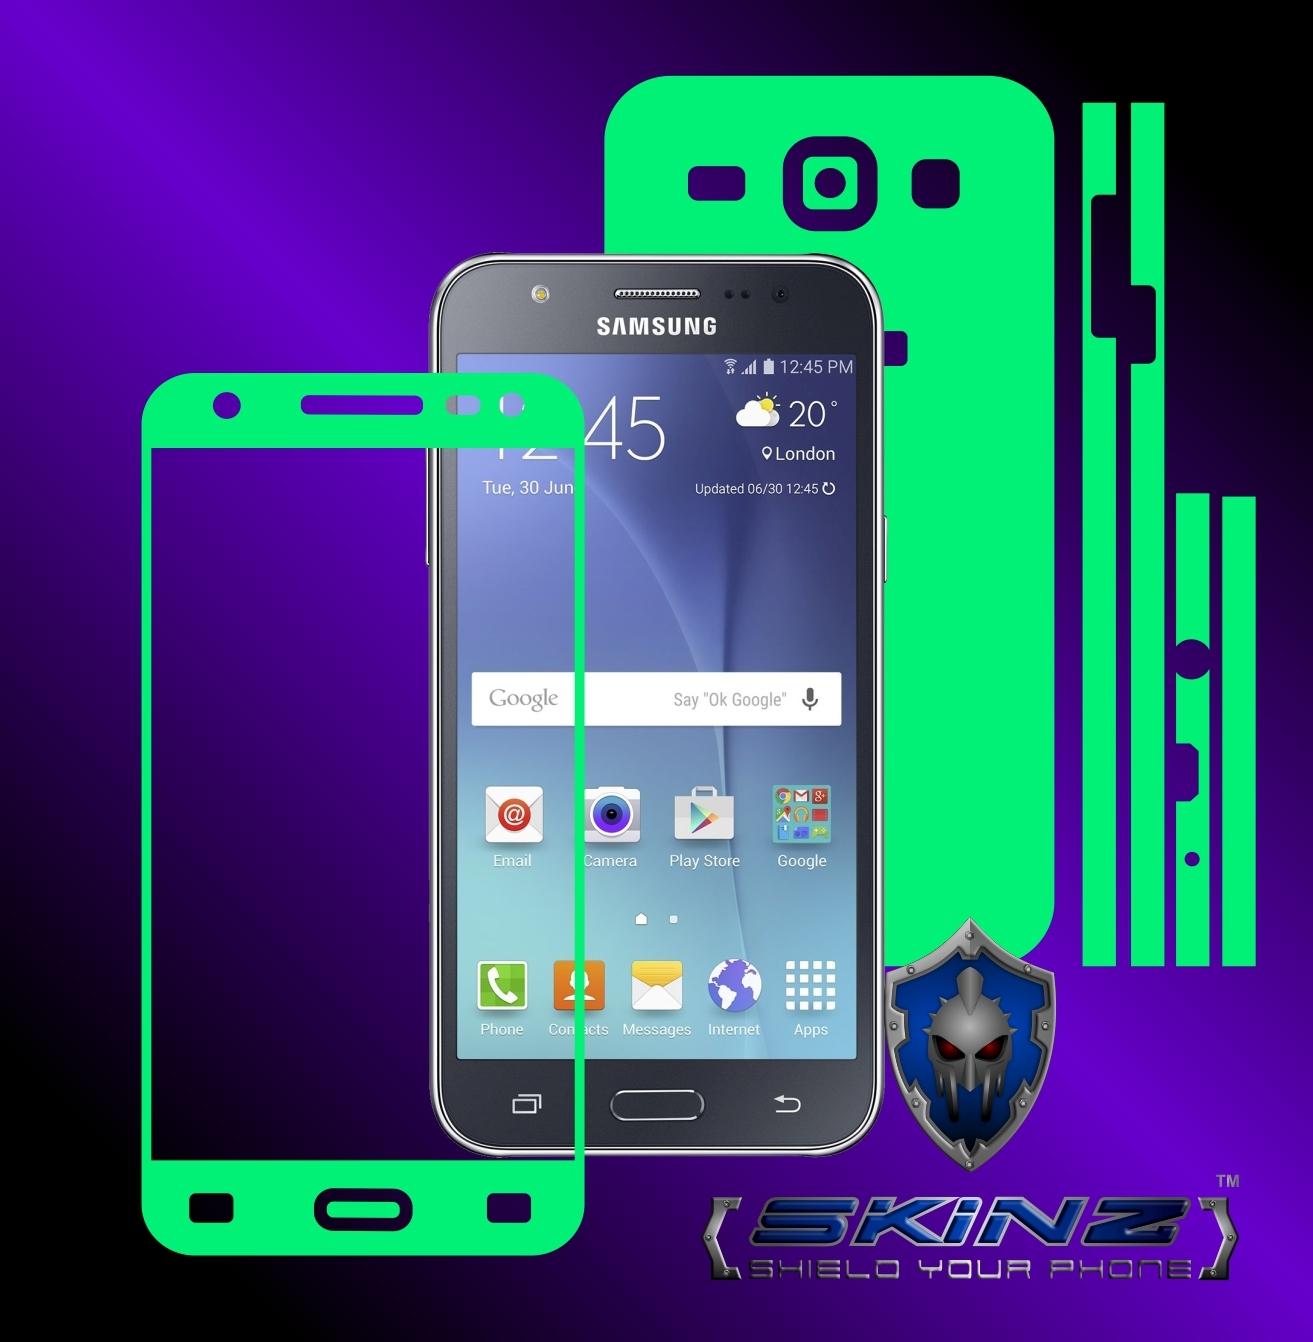 Samsung galaxy j5 glow in the dark full body skin